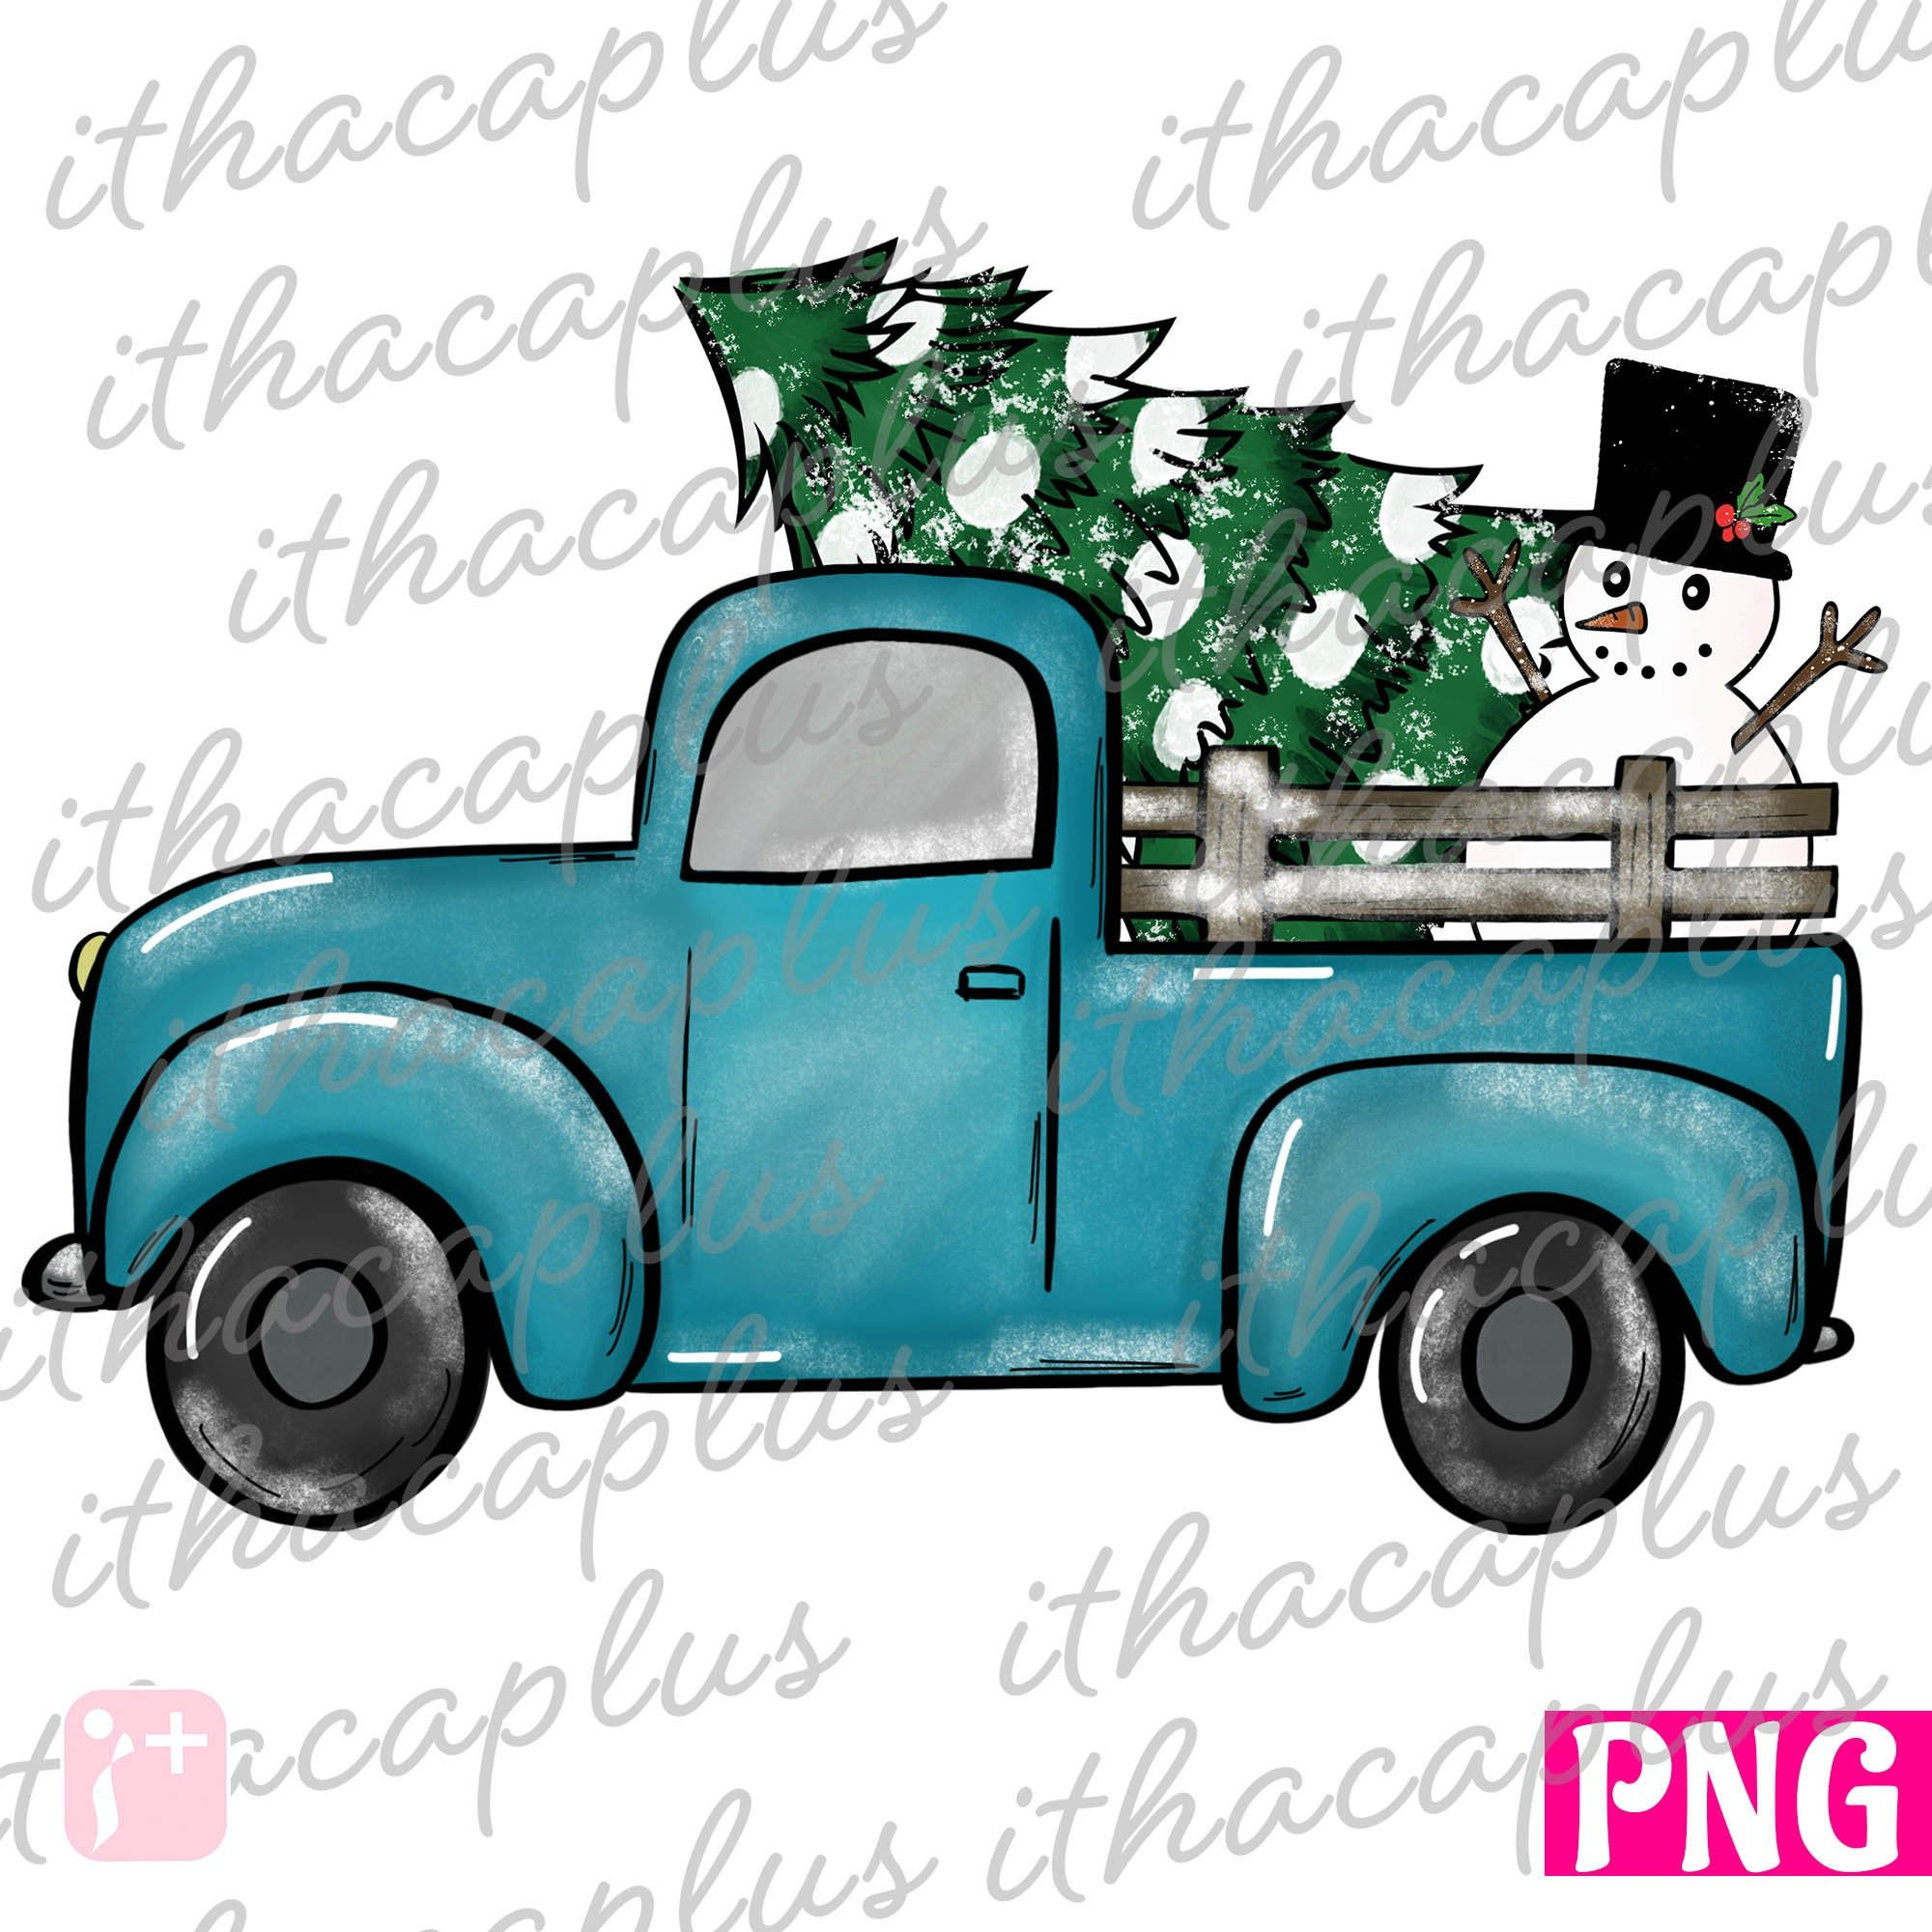 Christmas Png Sublimation Christmas Tree Blue Truck Etsy In 2020 Vintage Truck Christmas Christmas Tree Truck Christmas Truck